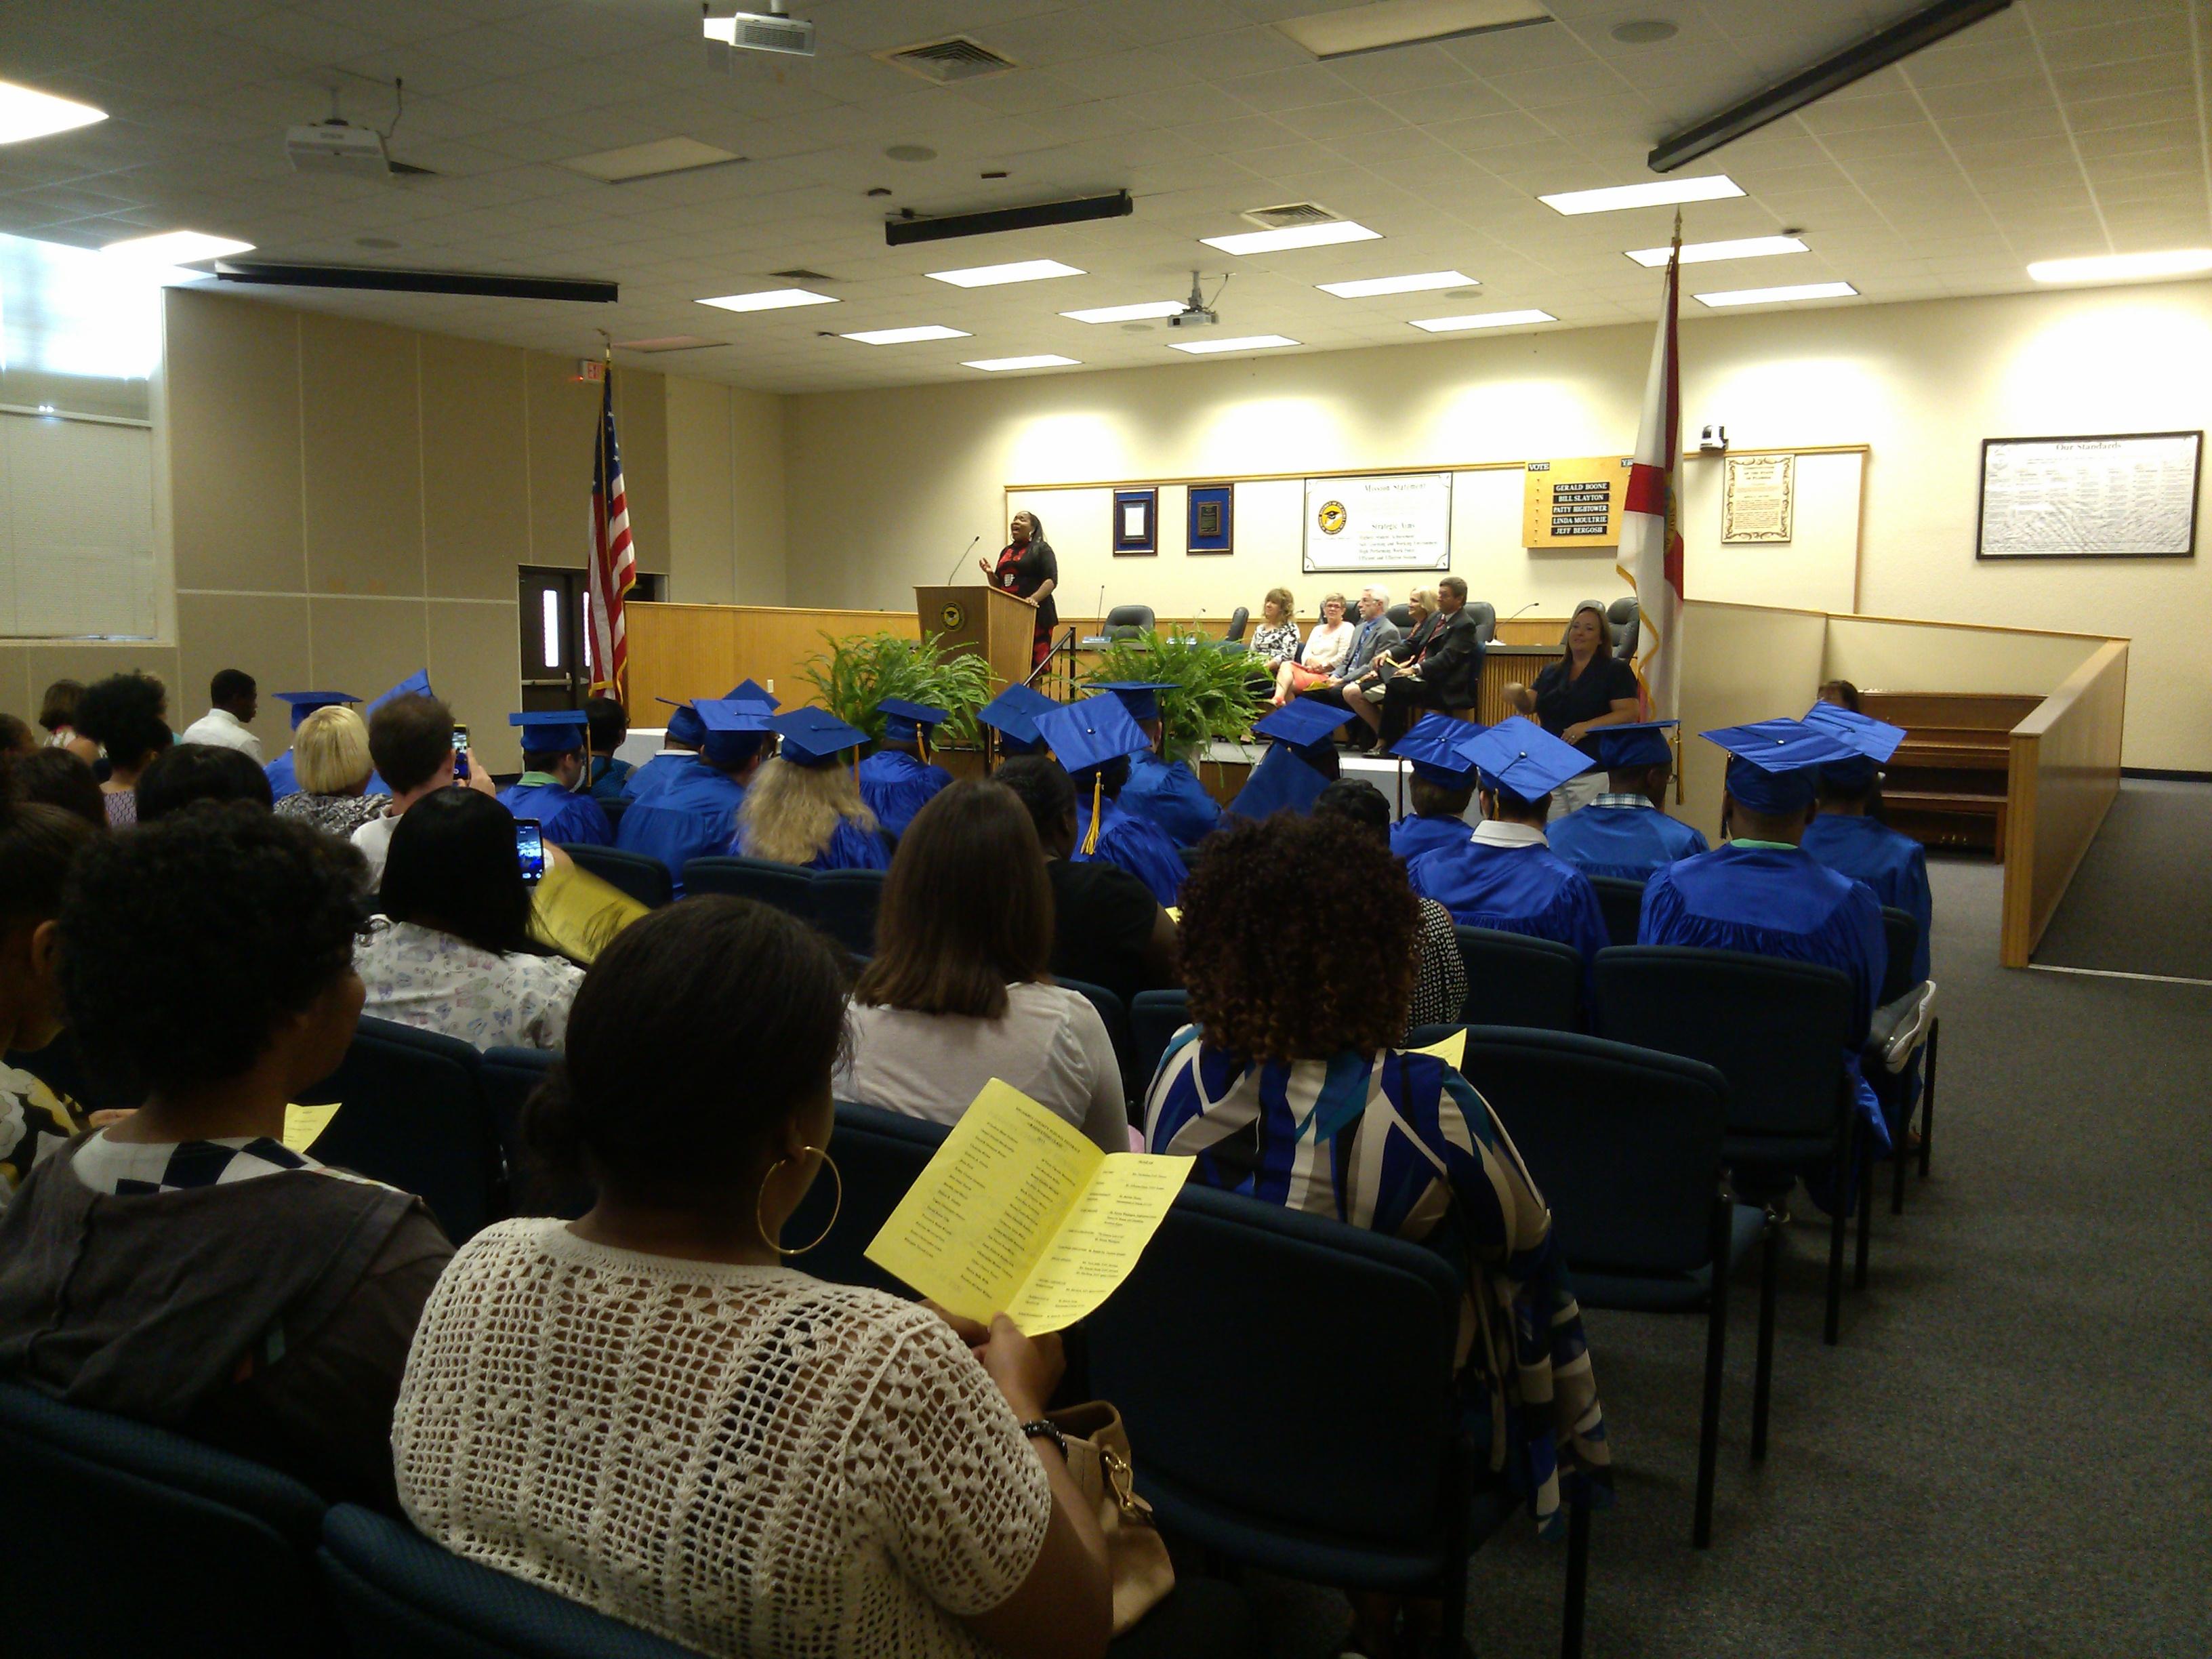 Katrina Washington singing at the Escambia County School District Graduation ceremony.